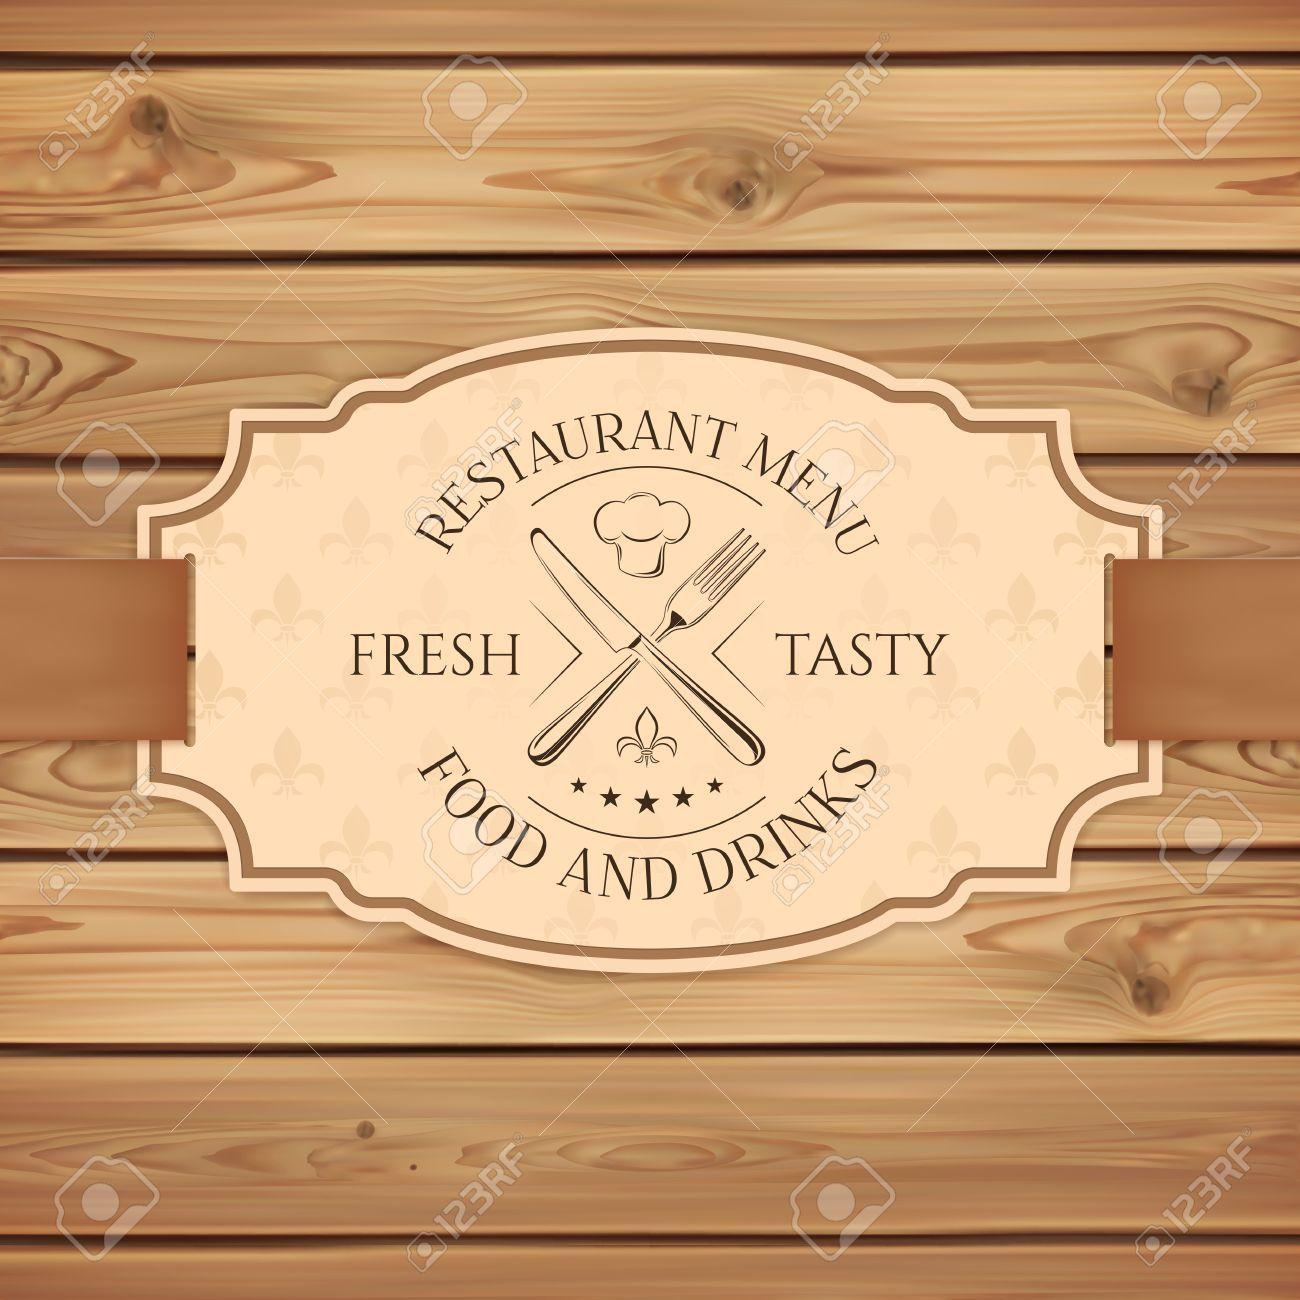 Resultado de imagen para logos de restaurantes | restaurantes ...